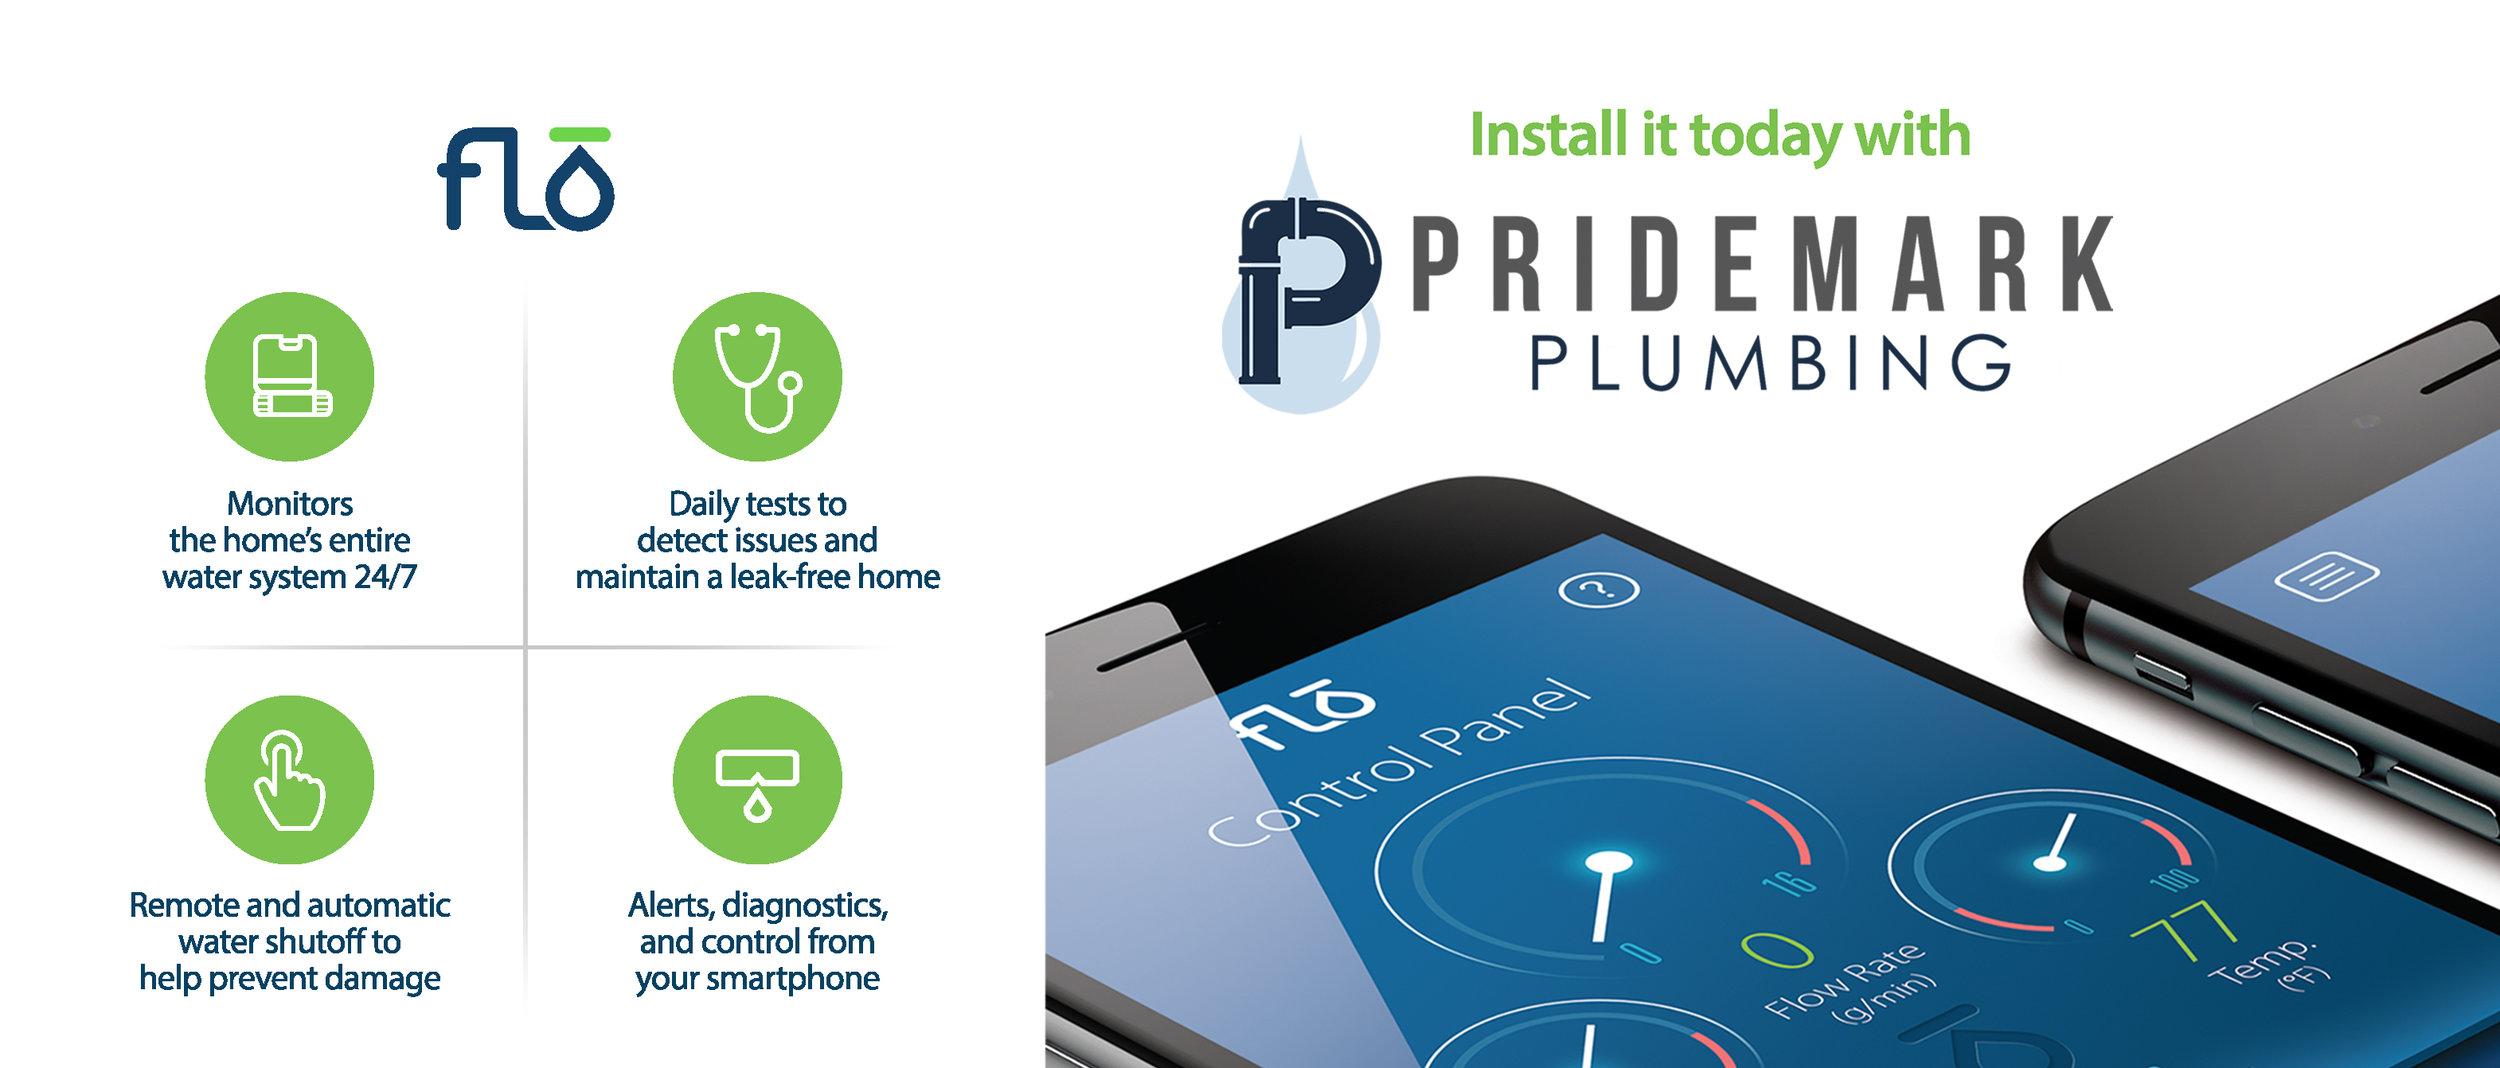 flo-pridemark-plumbing-surprise-peoria-buckeye-glendale.jpg